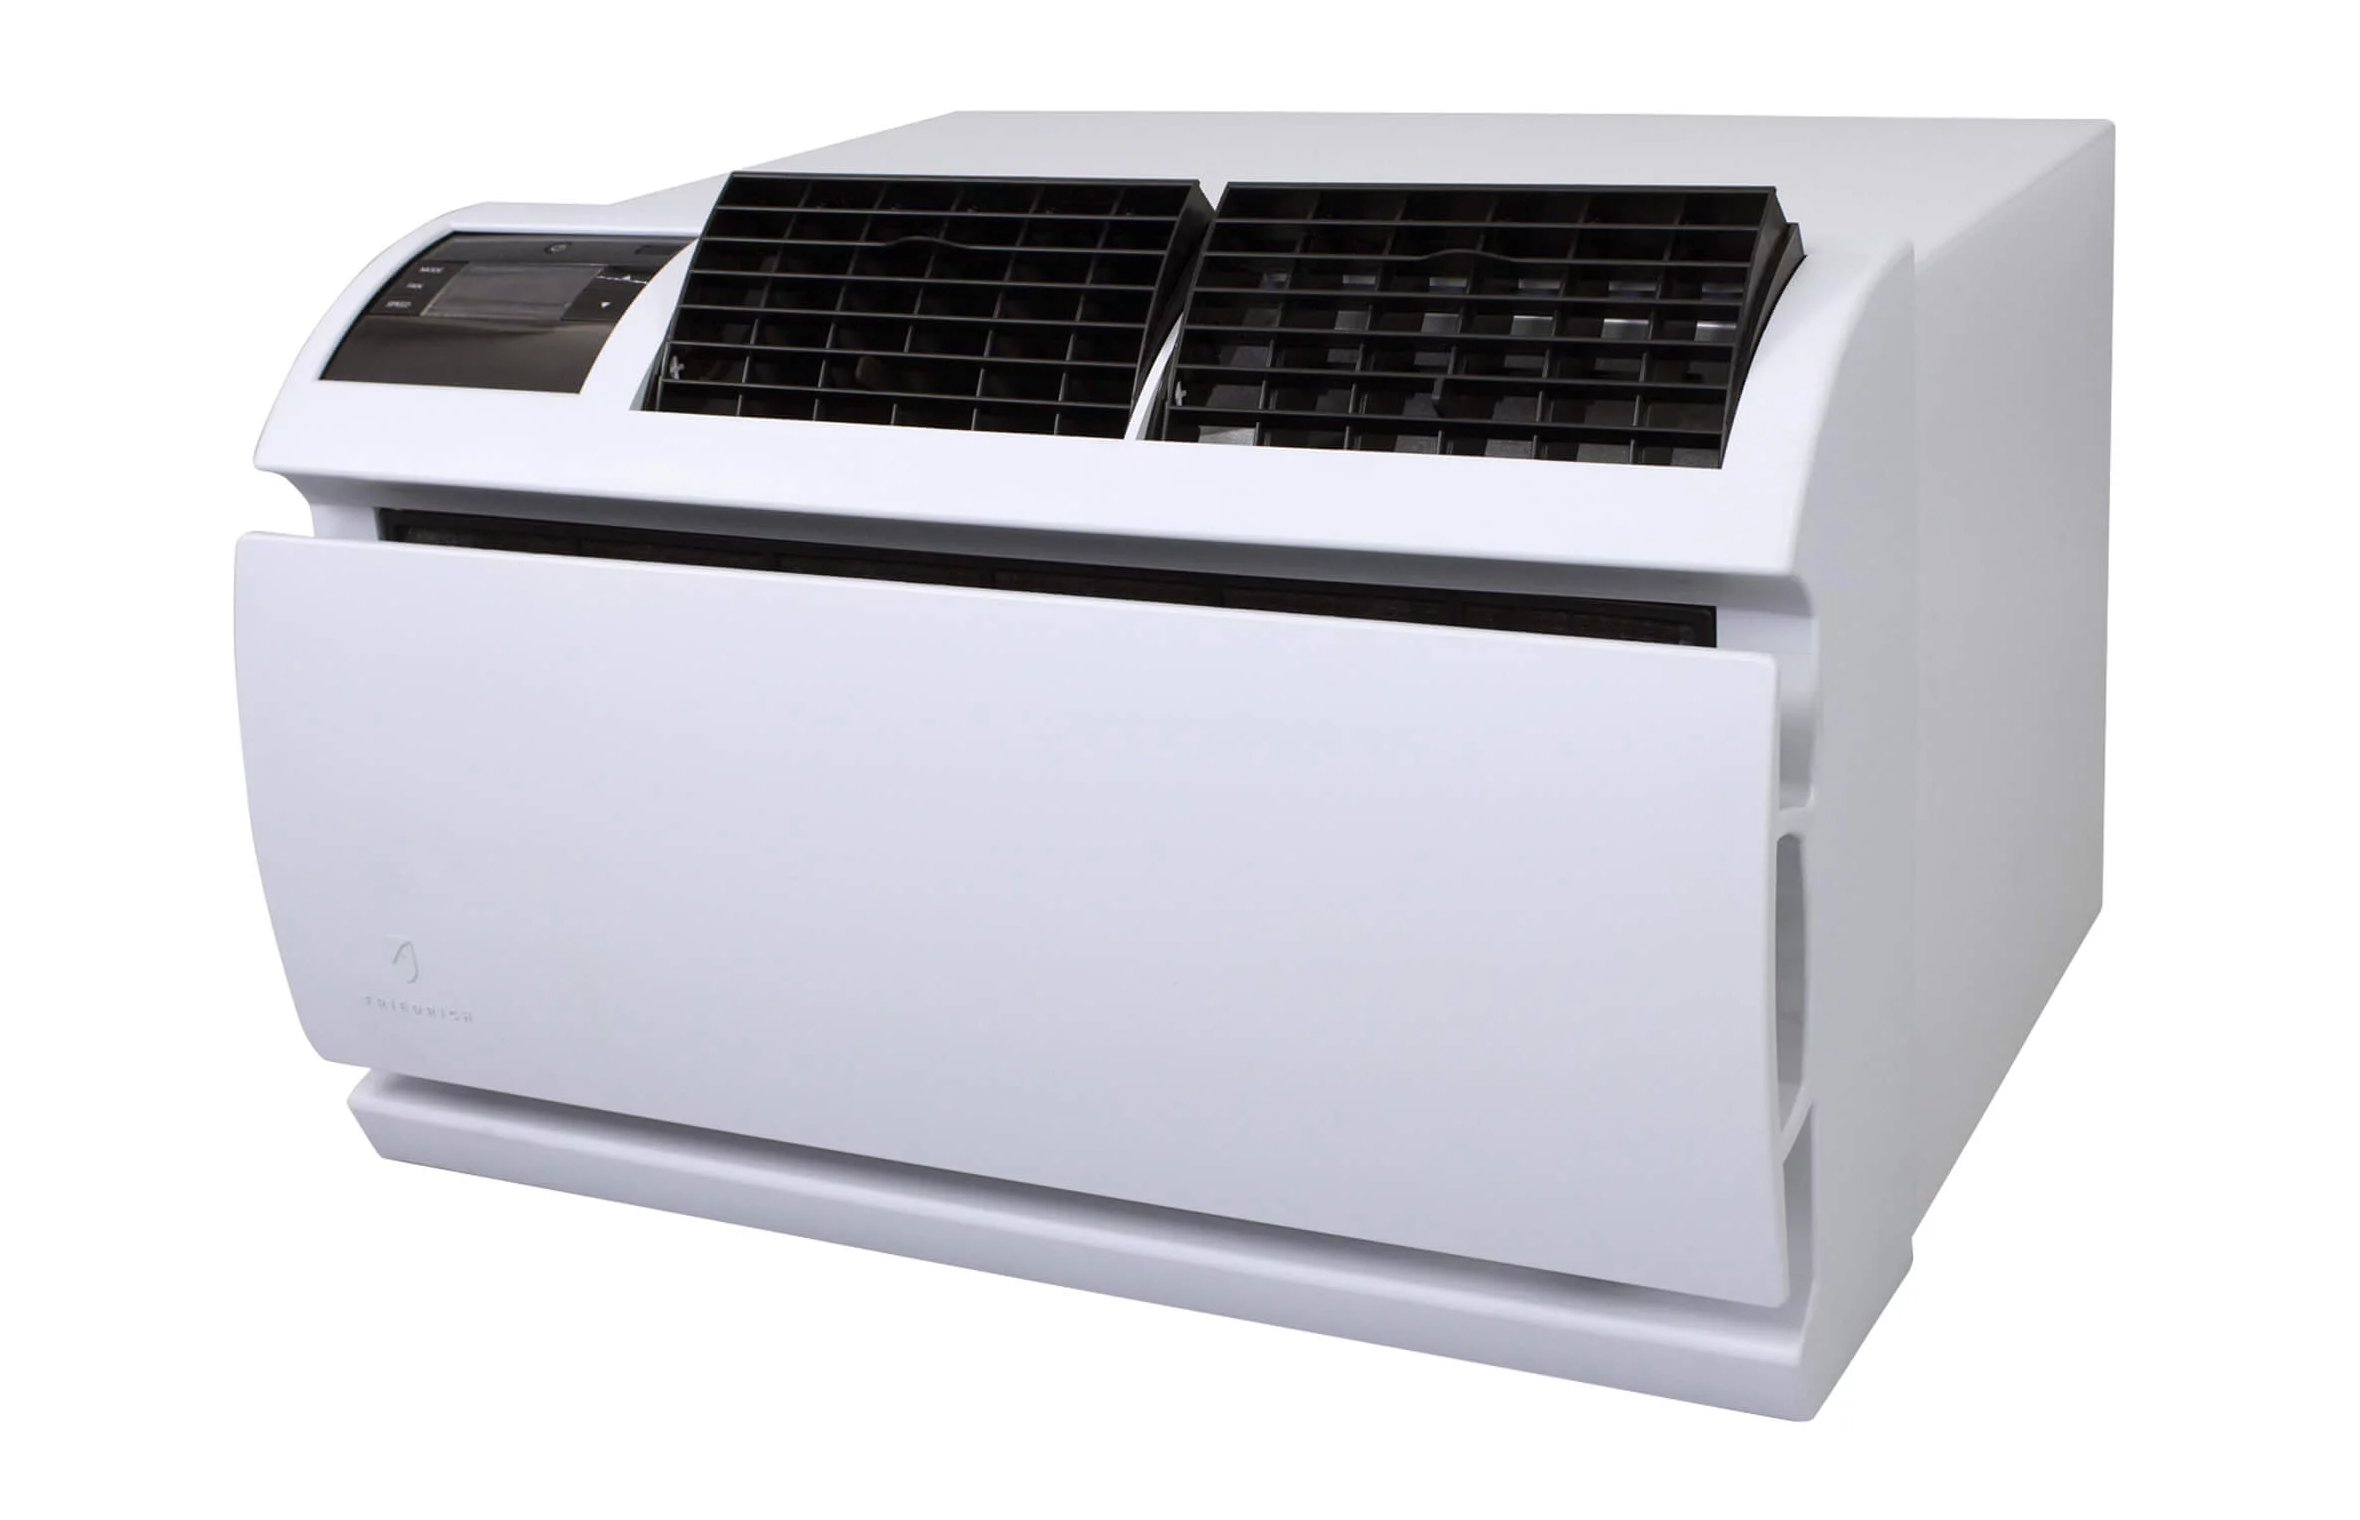 Friedrich WCT16A30A Wallmaster Series 15400 BTU Smart WiFi Through-the-Wall Air Conditioner - 208/230 Volt